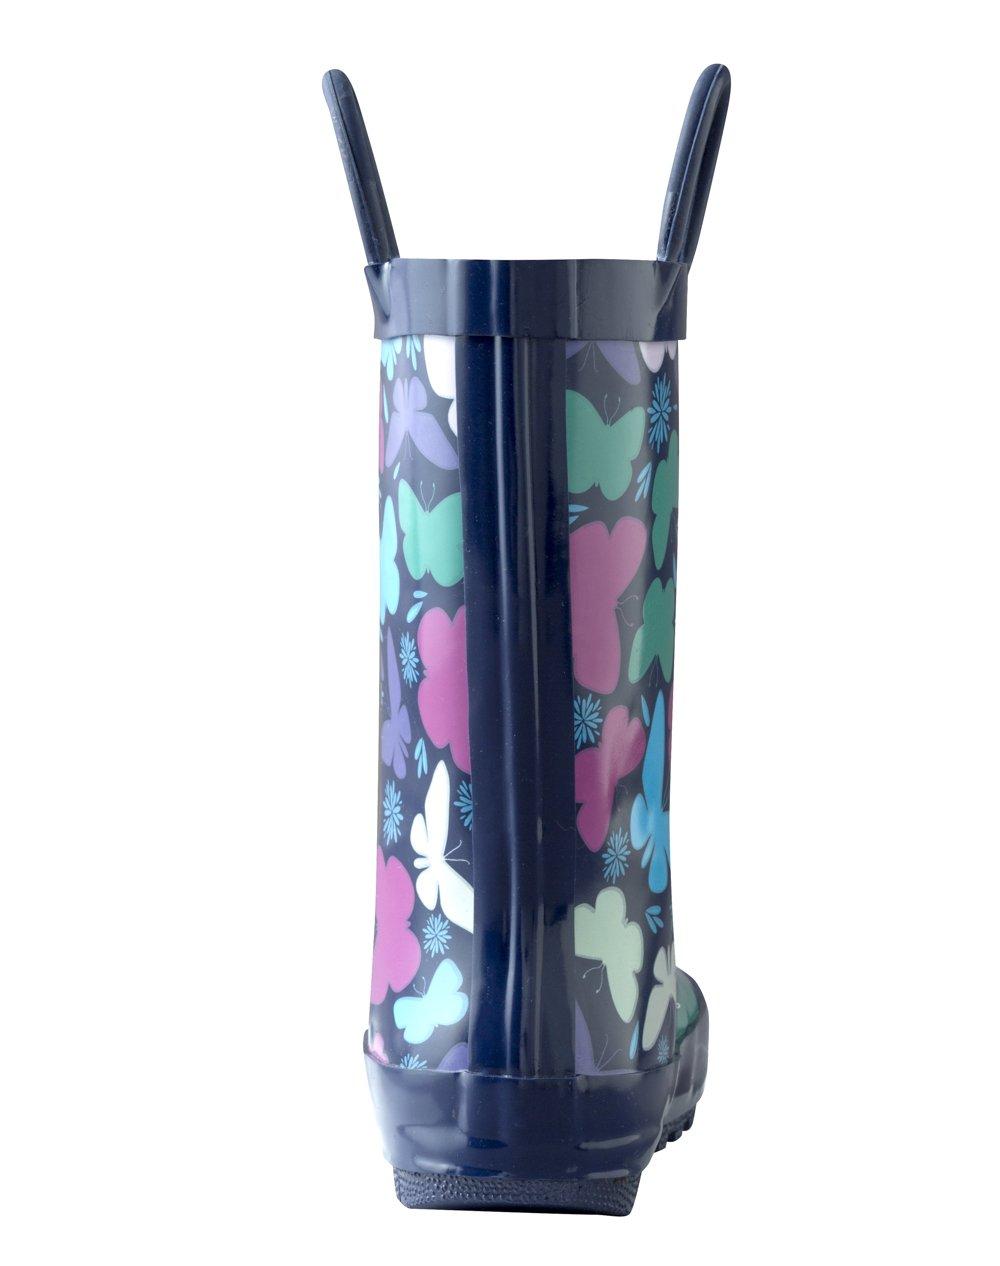 Oakiwear Kids Rubber Rain Boots with Easy-On Handles, Butterflies, 12T US Toddler